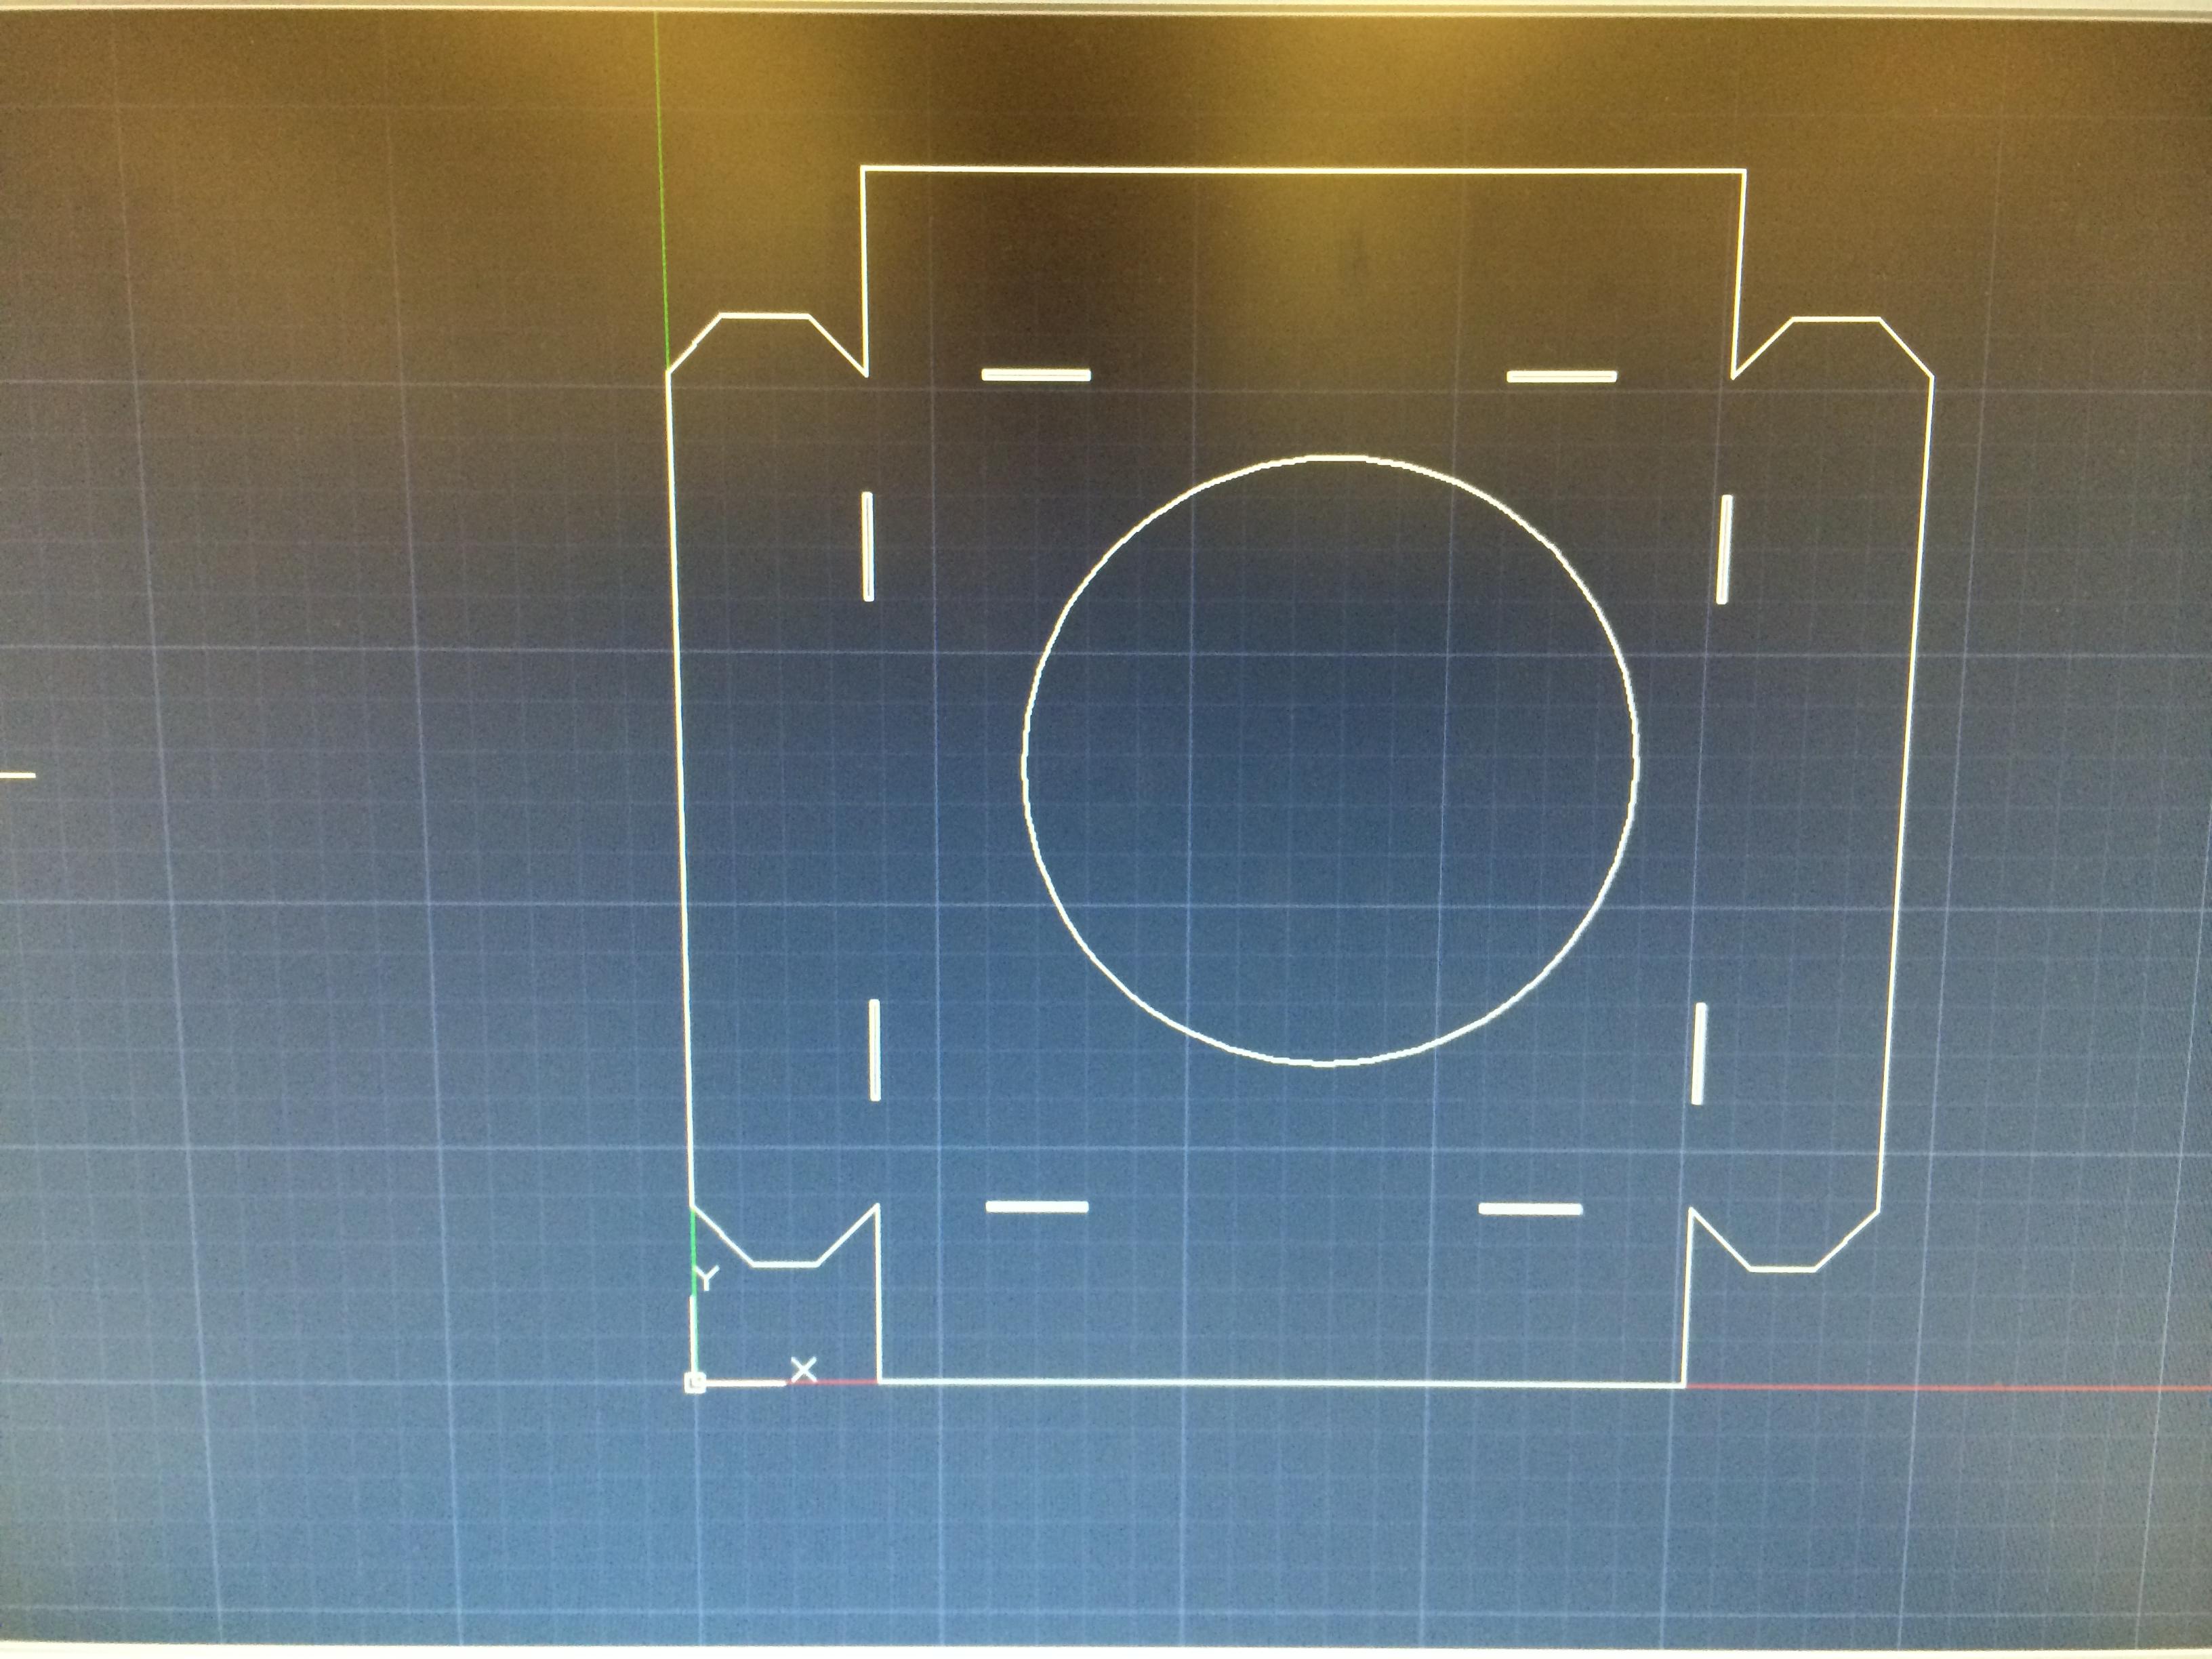 Laser cut a template for a sheetmetal box (flat pattern)